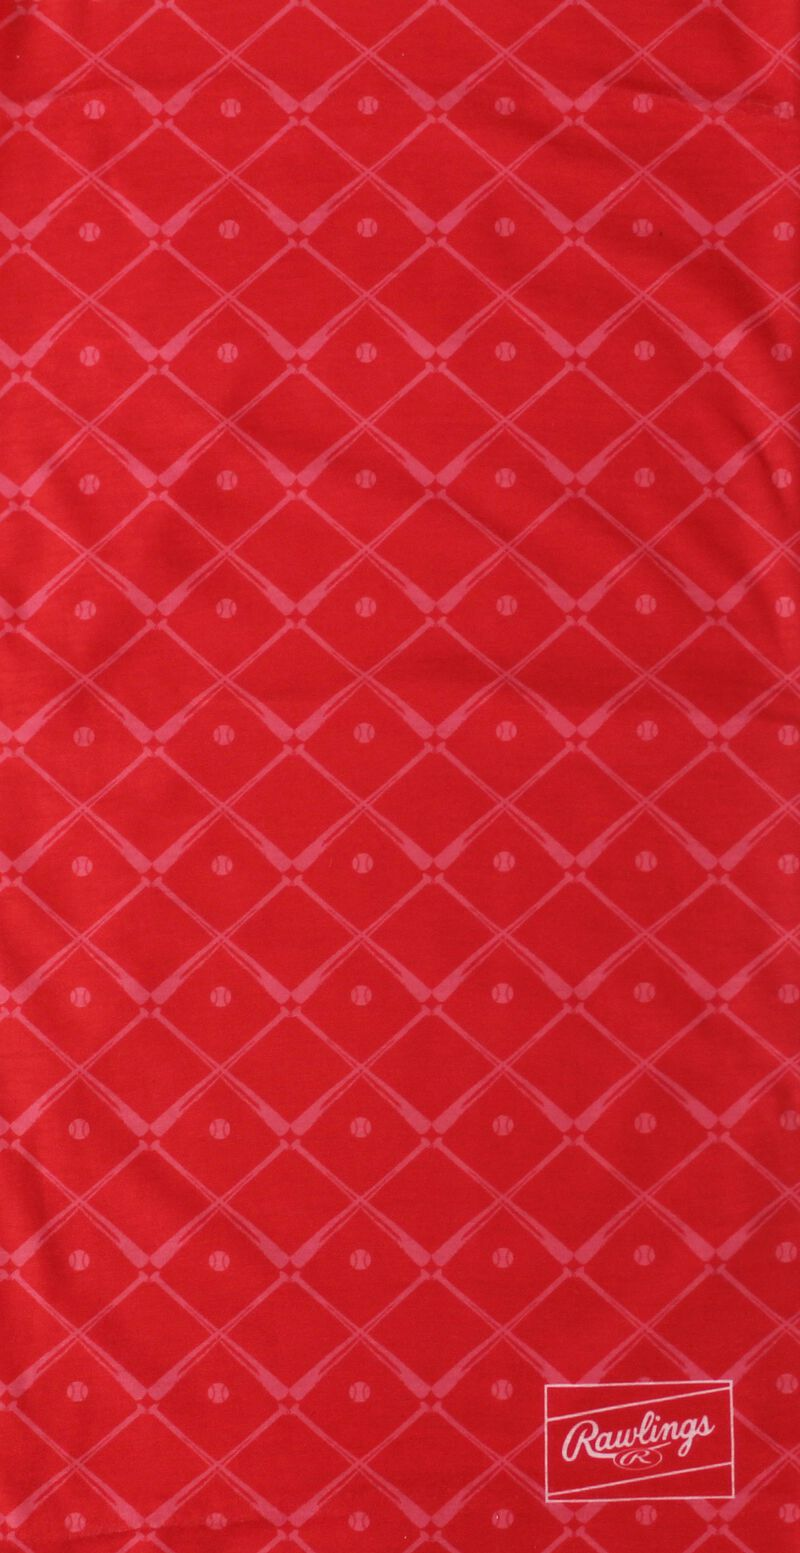 A red bats Rawlings multi functional gaiter - SKU: RC40005-600